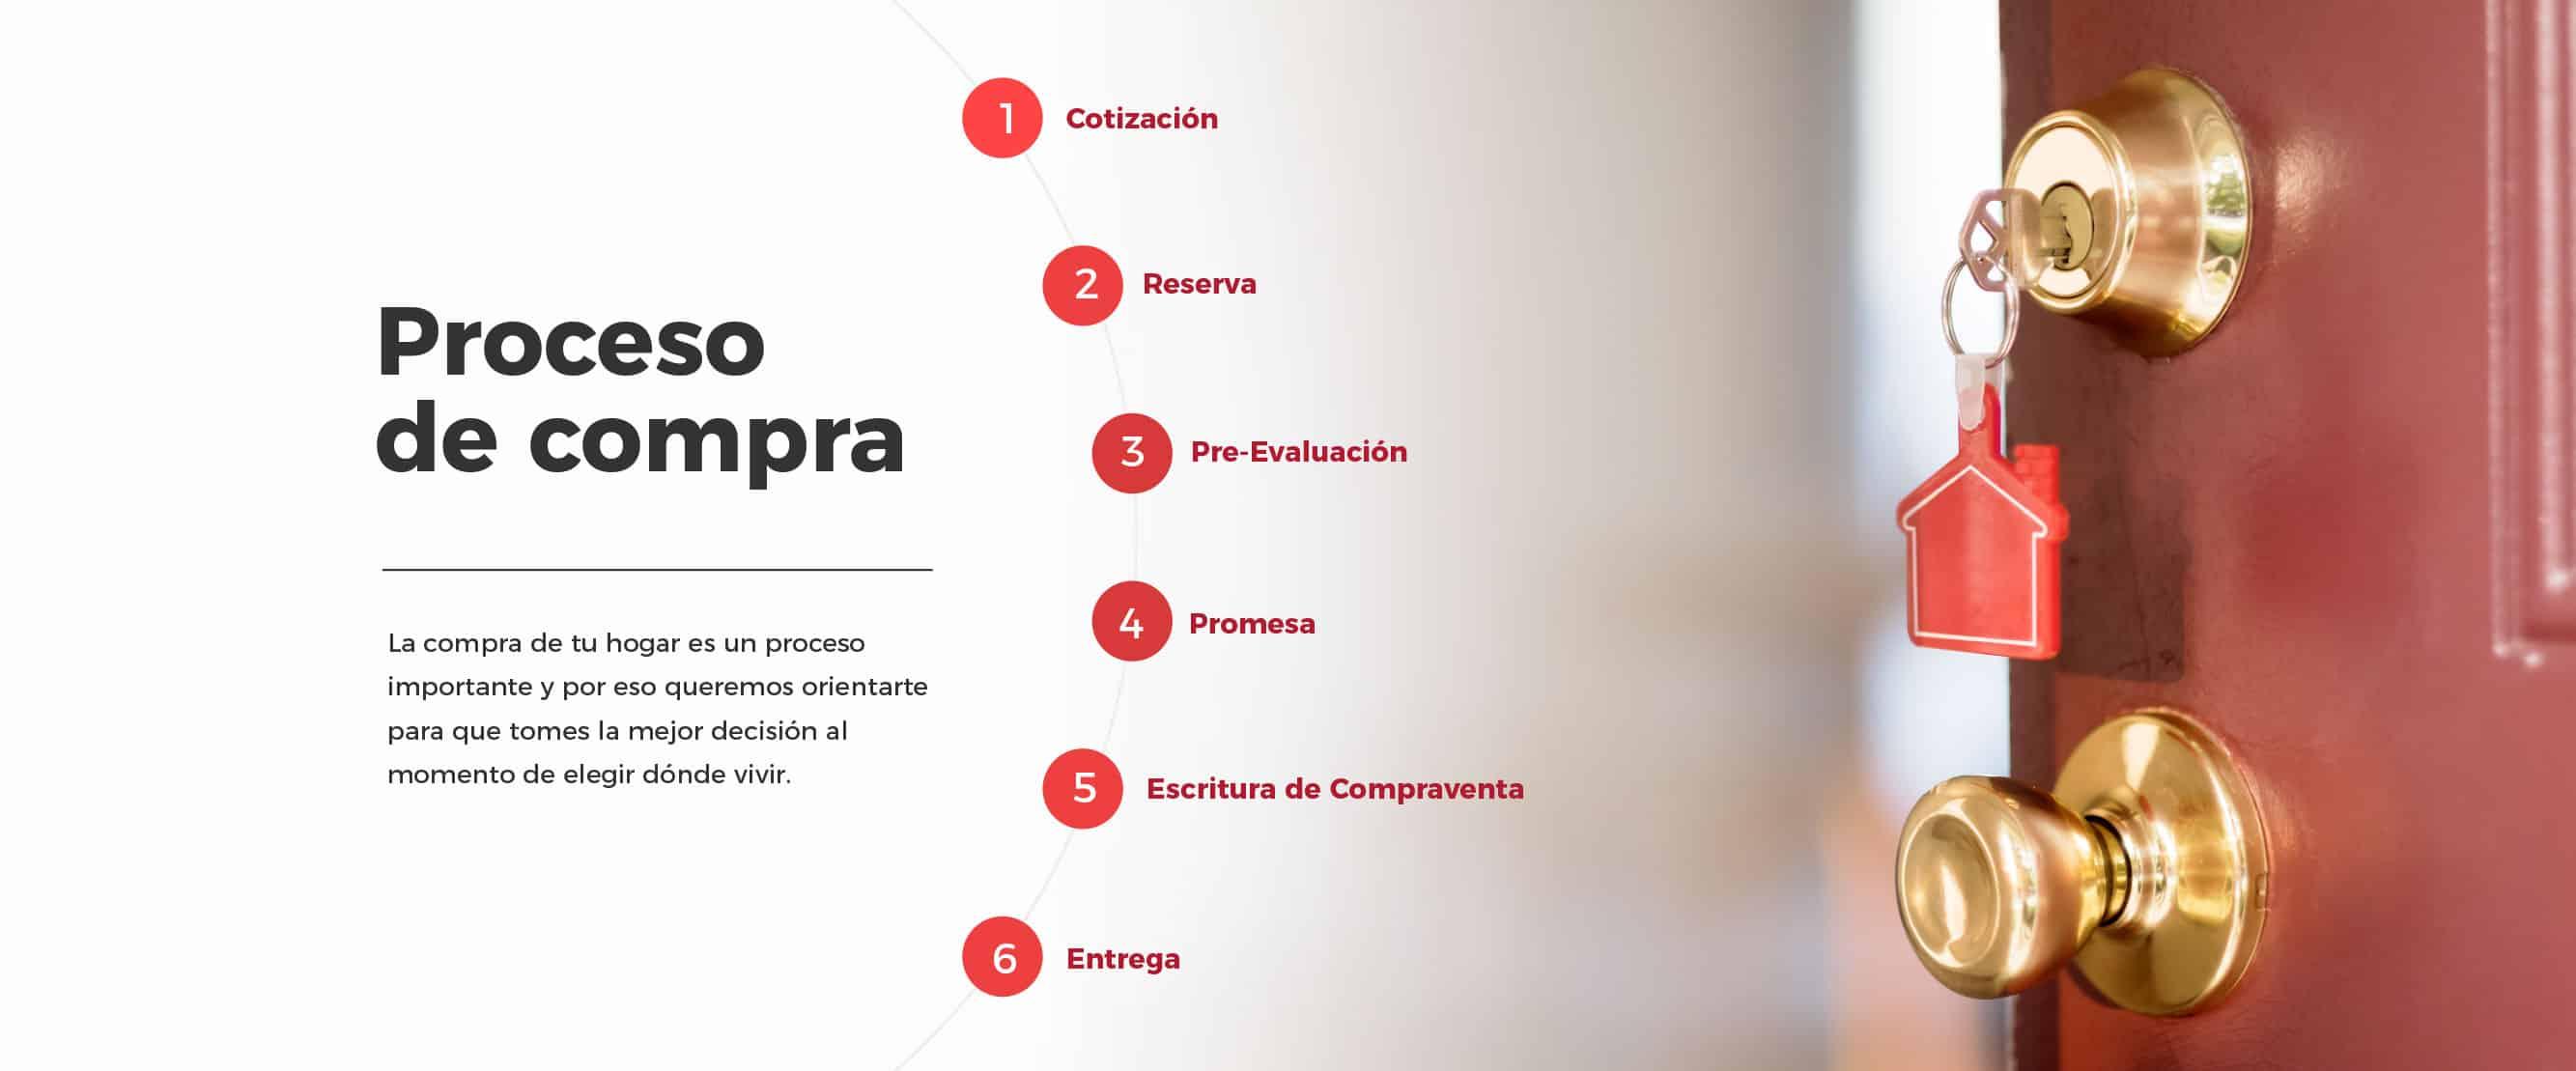 Proceso de compra Avellaneda